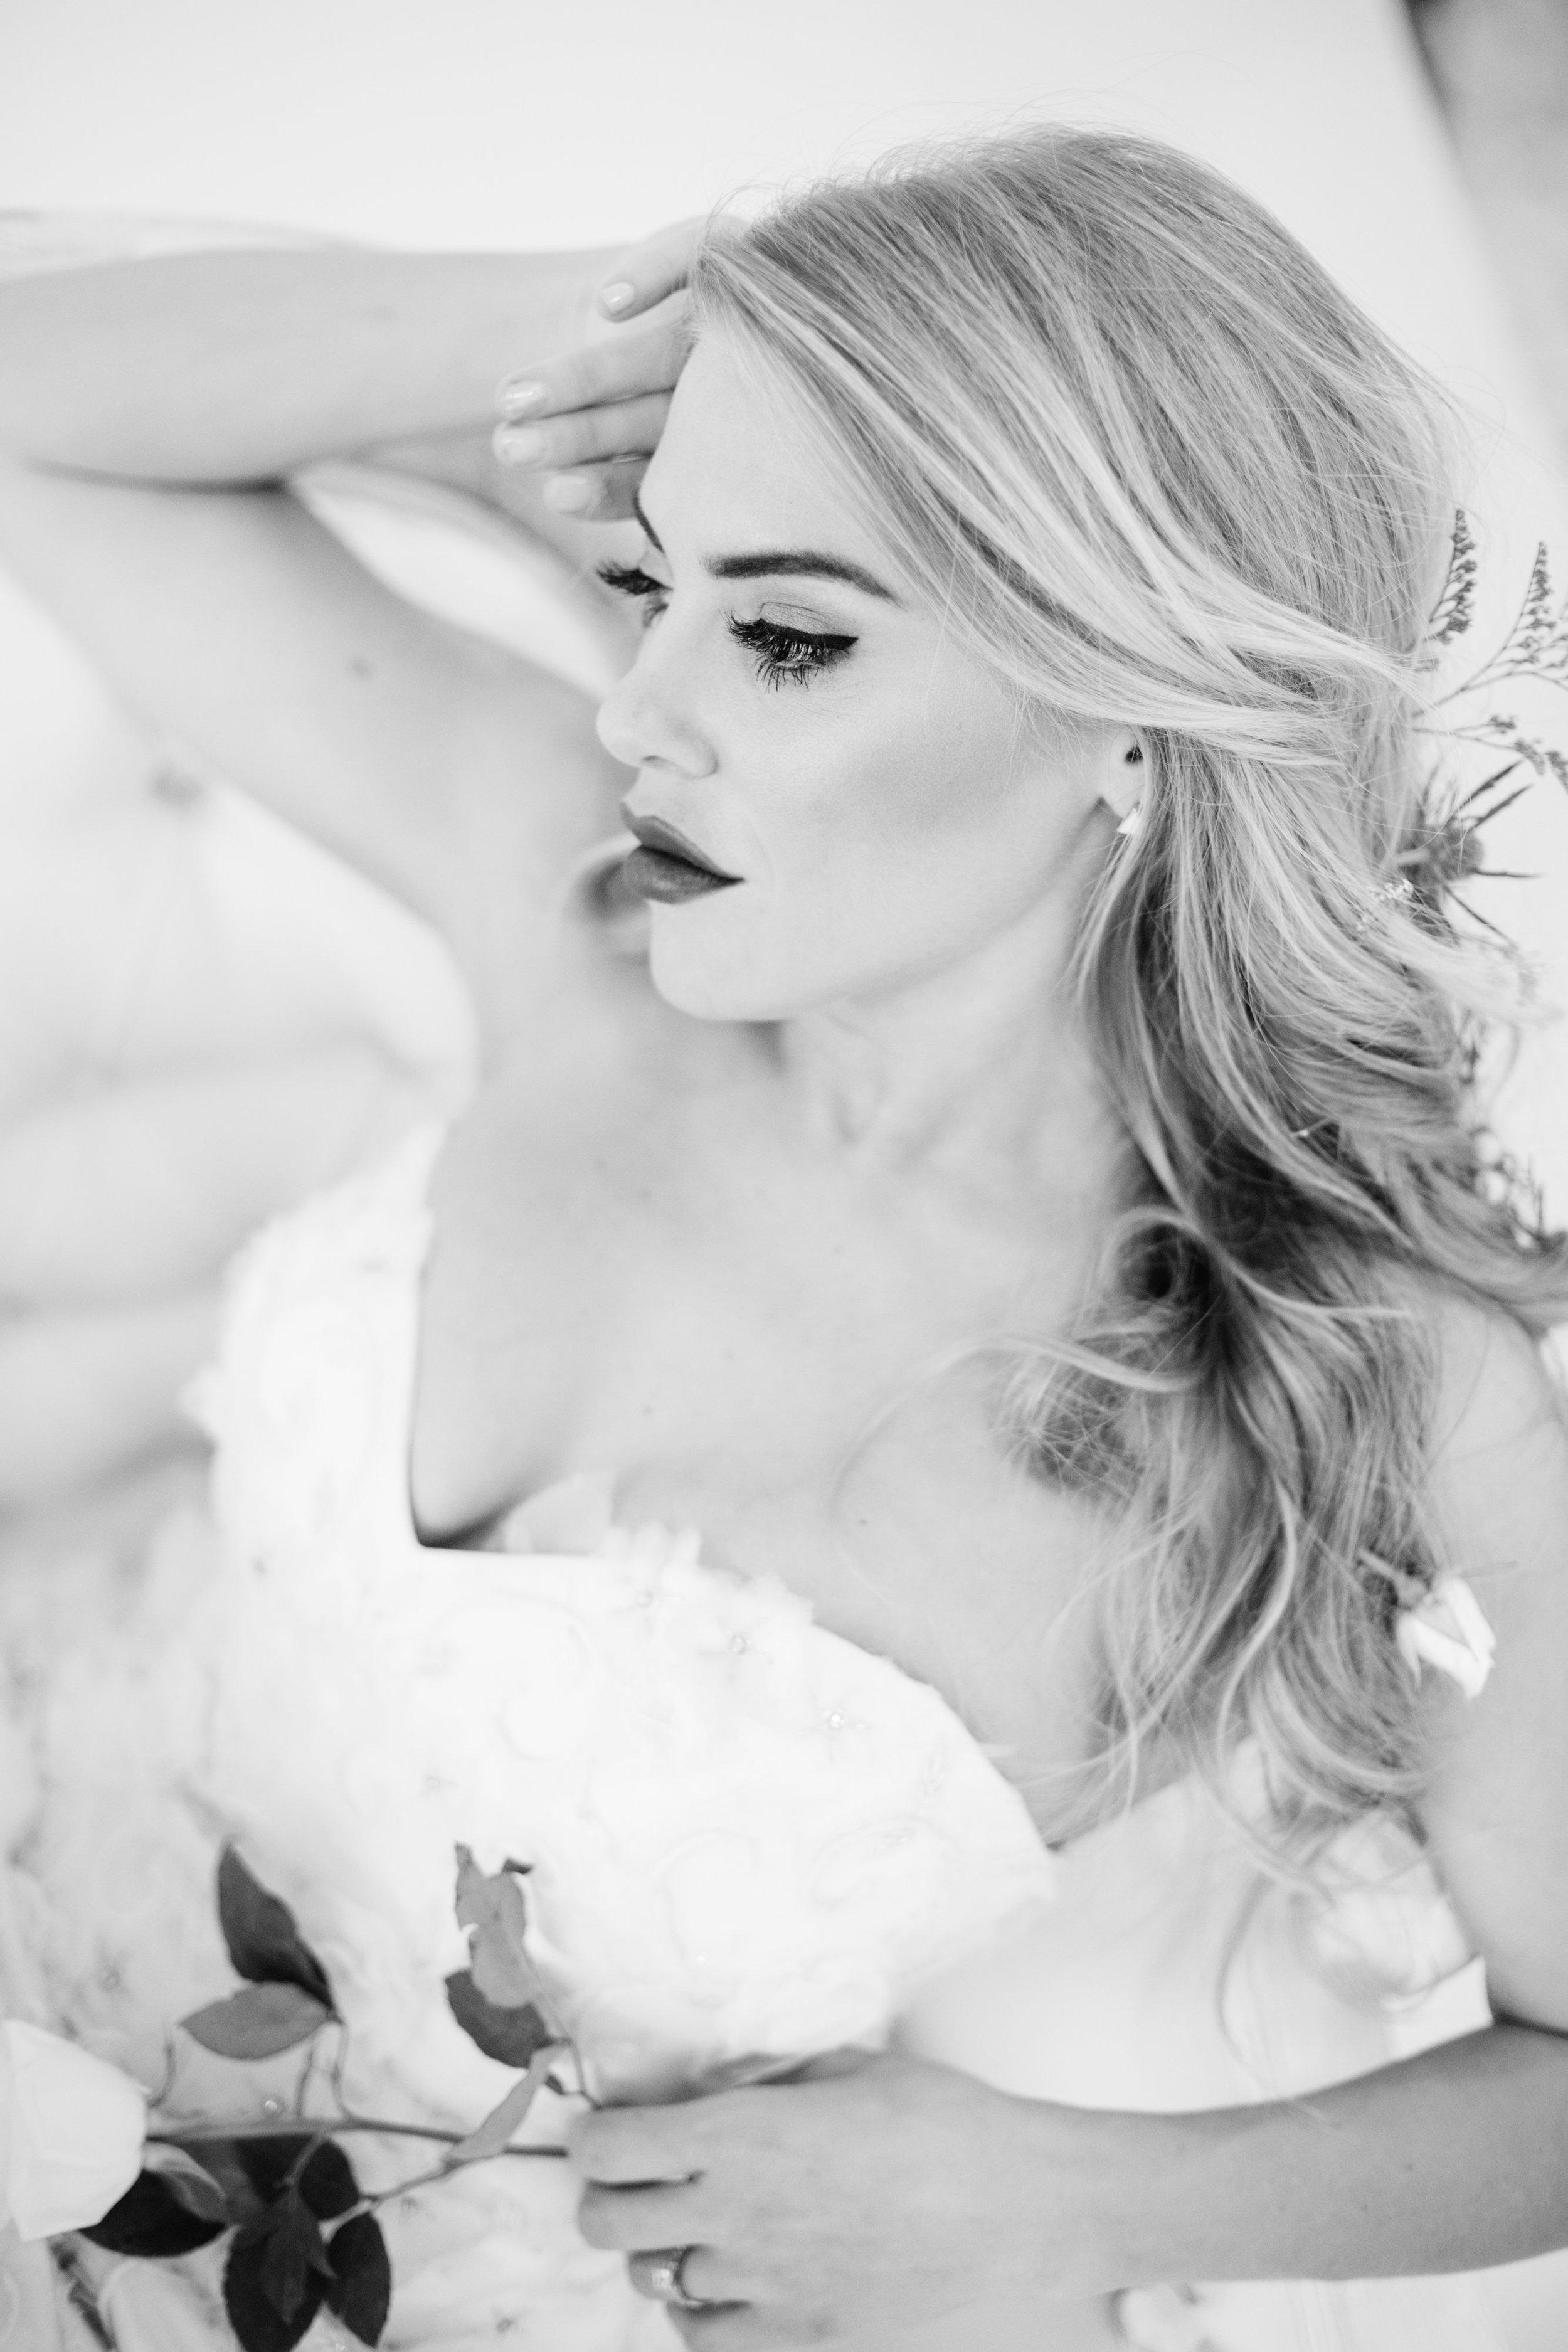 Photo by Anastasiia Photography